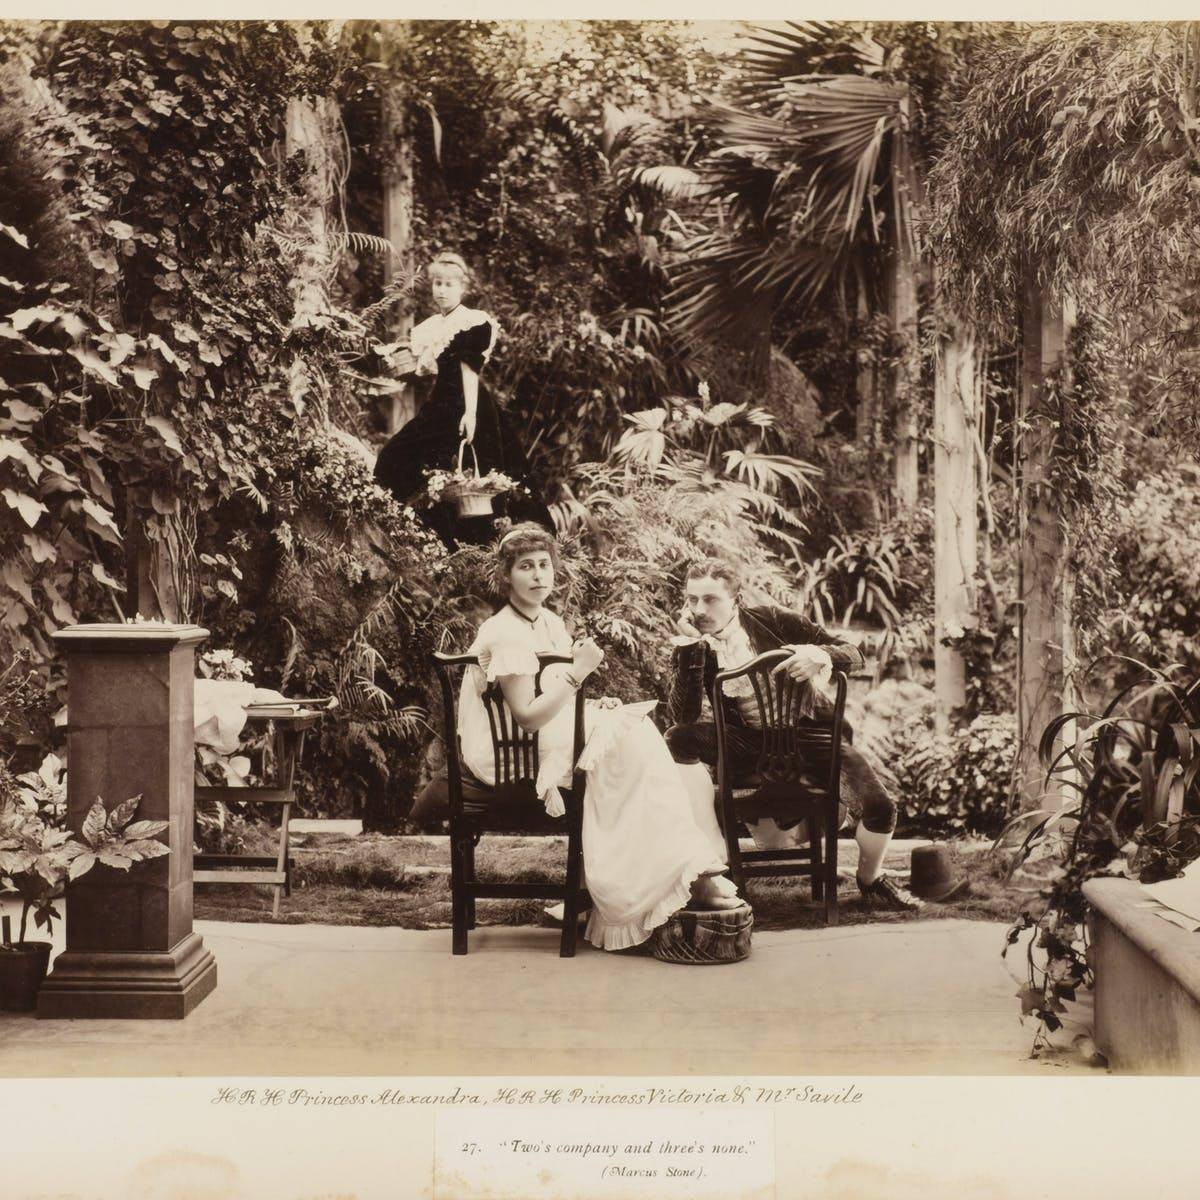 Shedding light on the 'Pre-Raphaelite stunners'